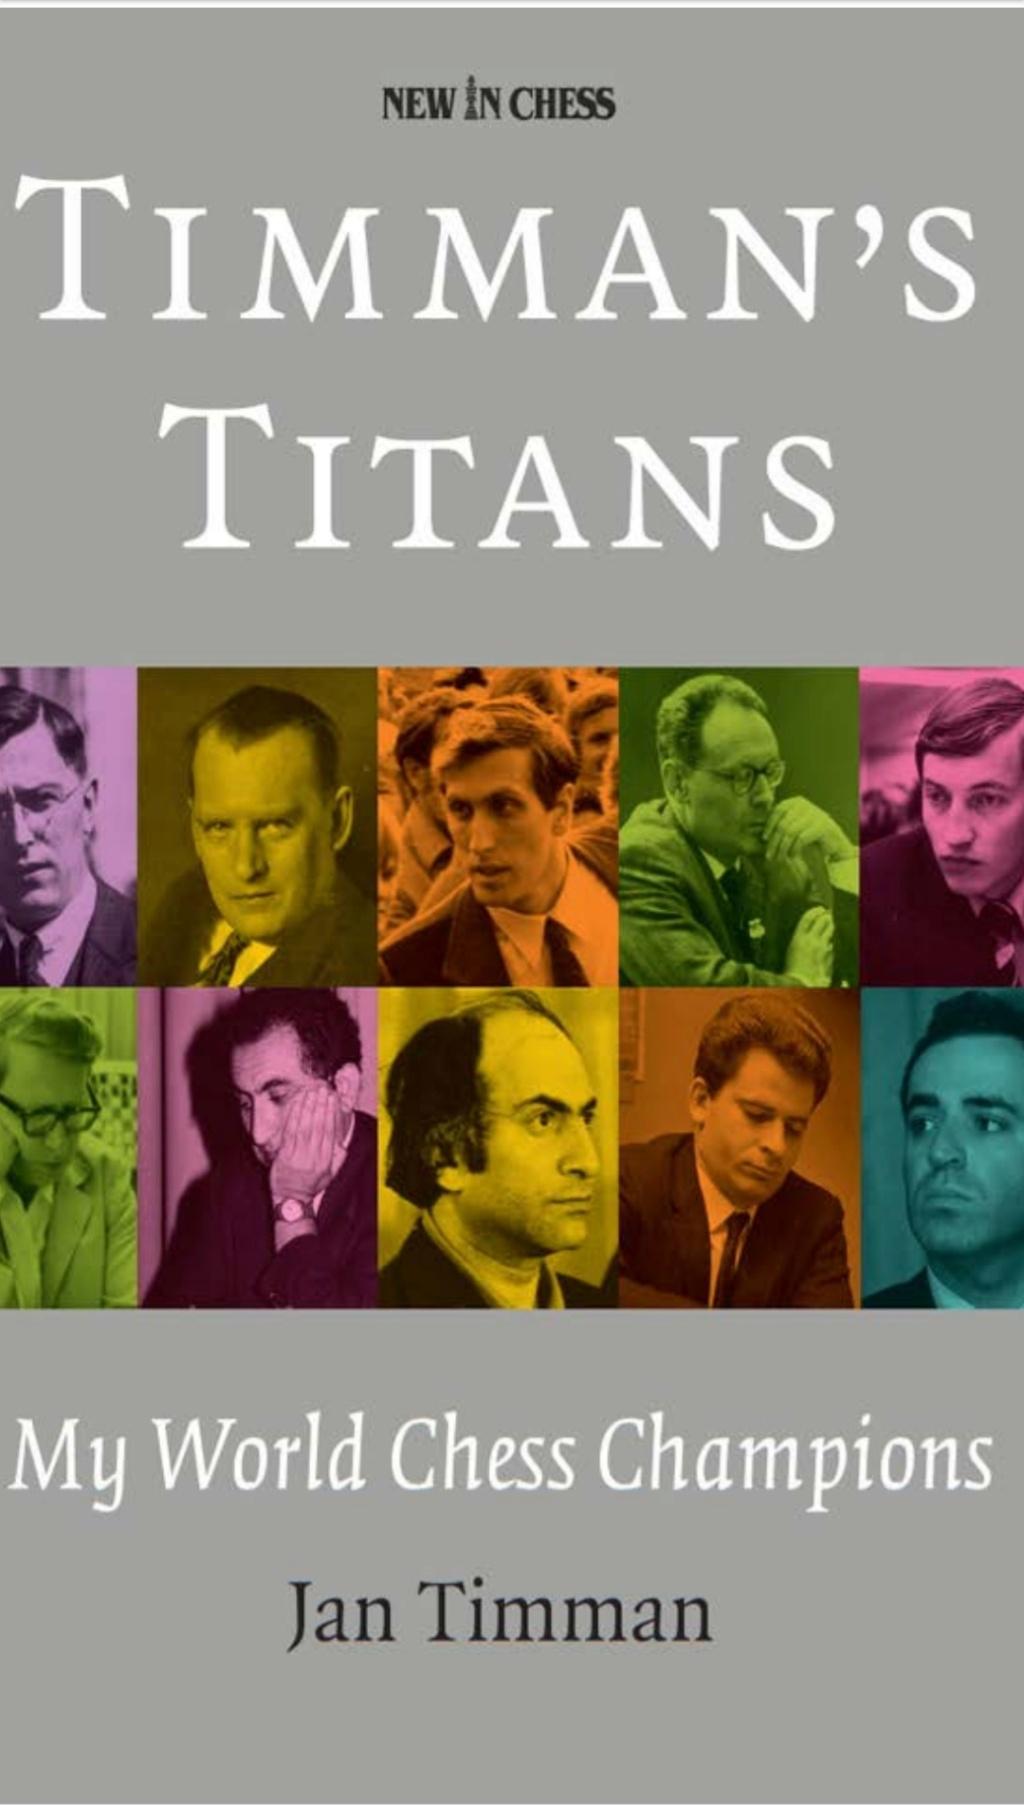 Timman's Titans: My World Chess Champions  Book by Jan Timman Screen82